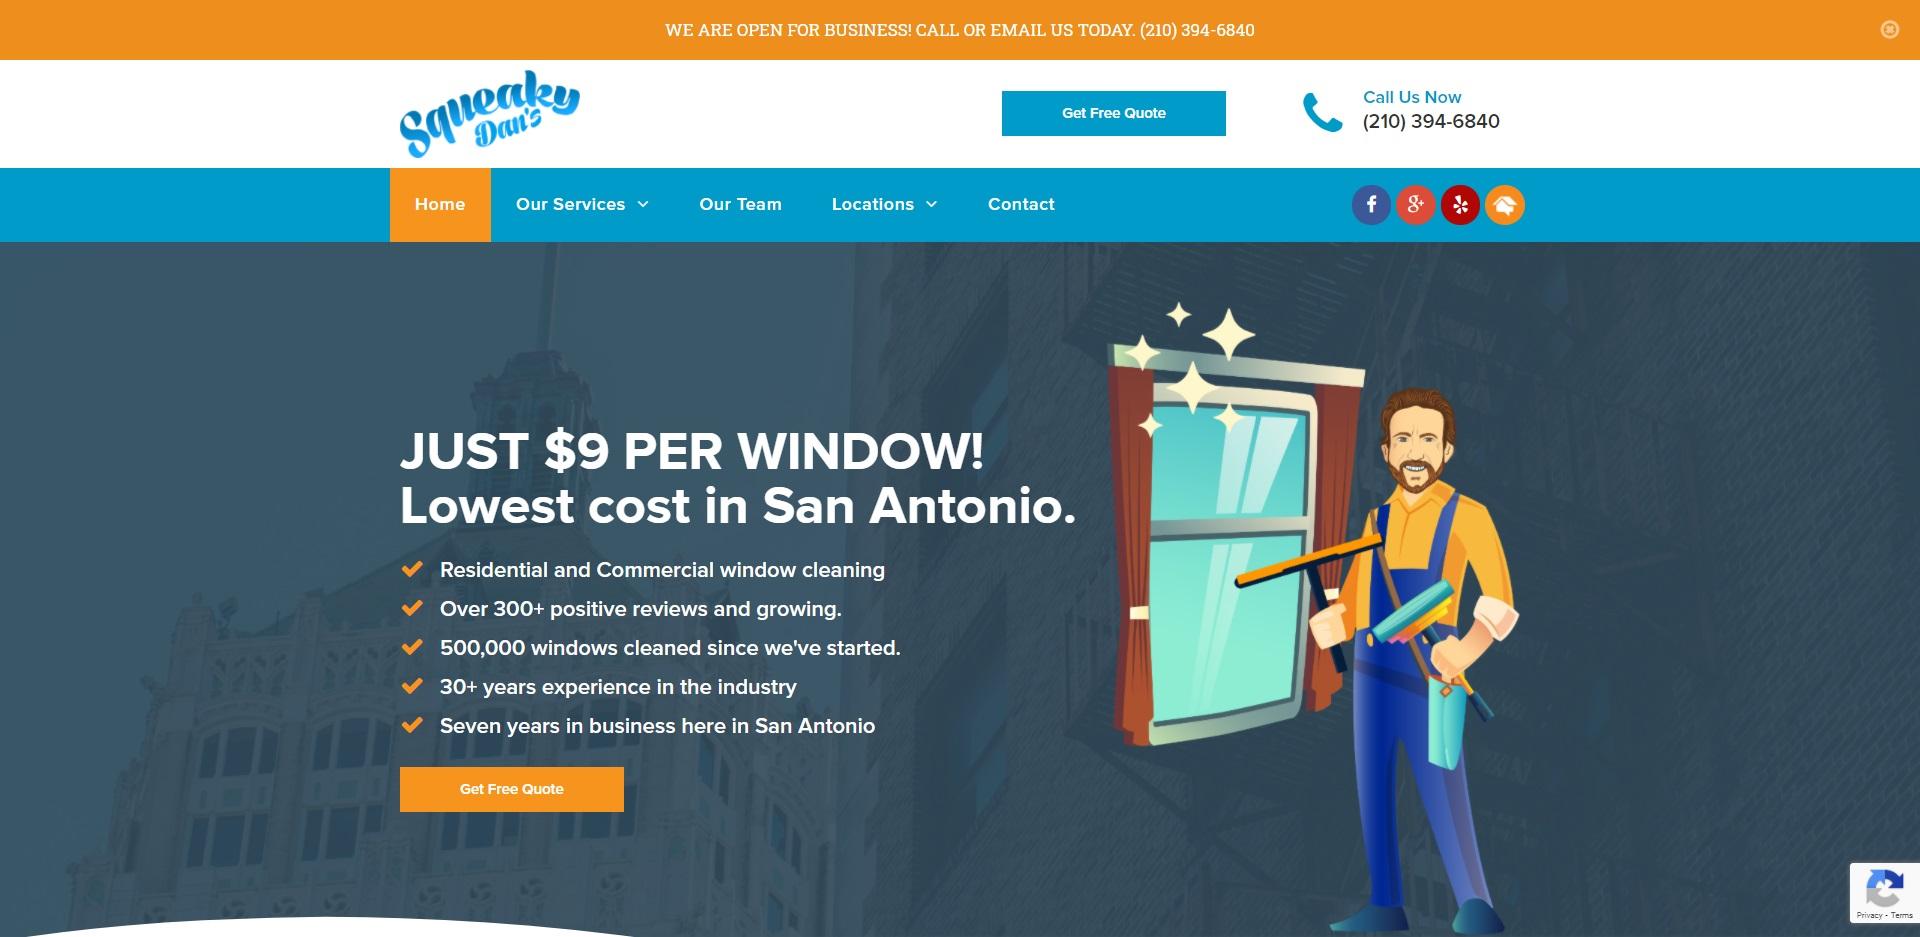 5 Best Window Companies in San Antonio